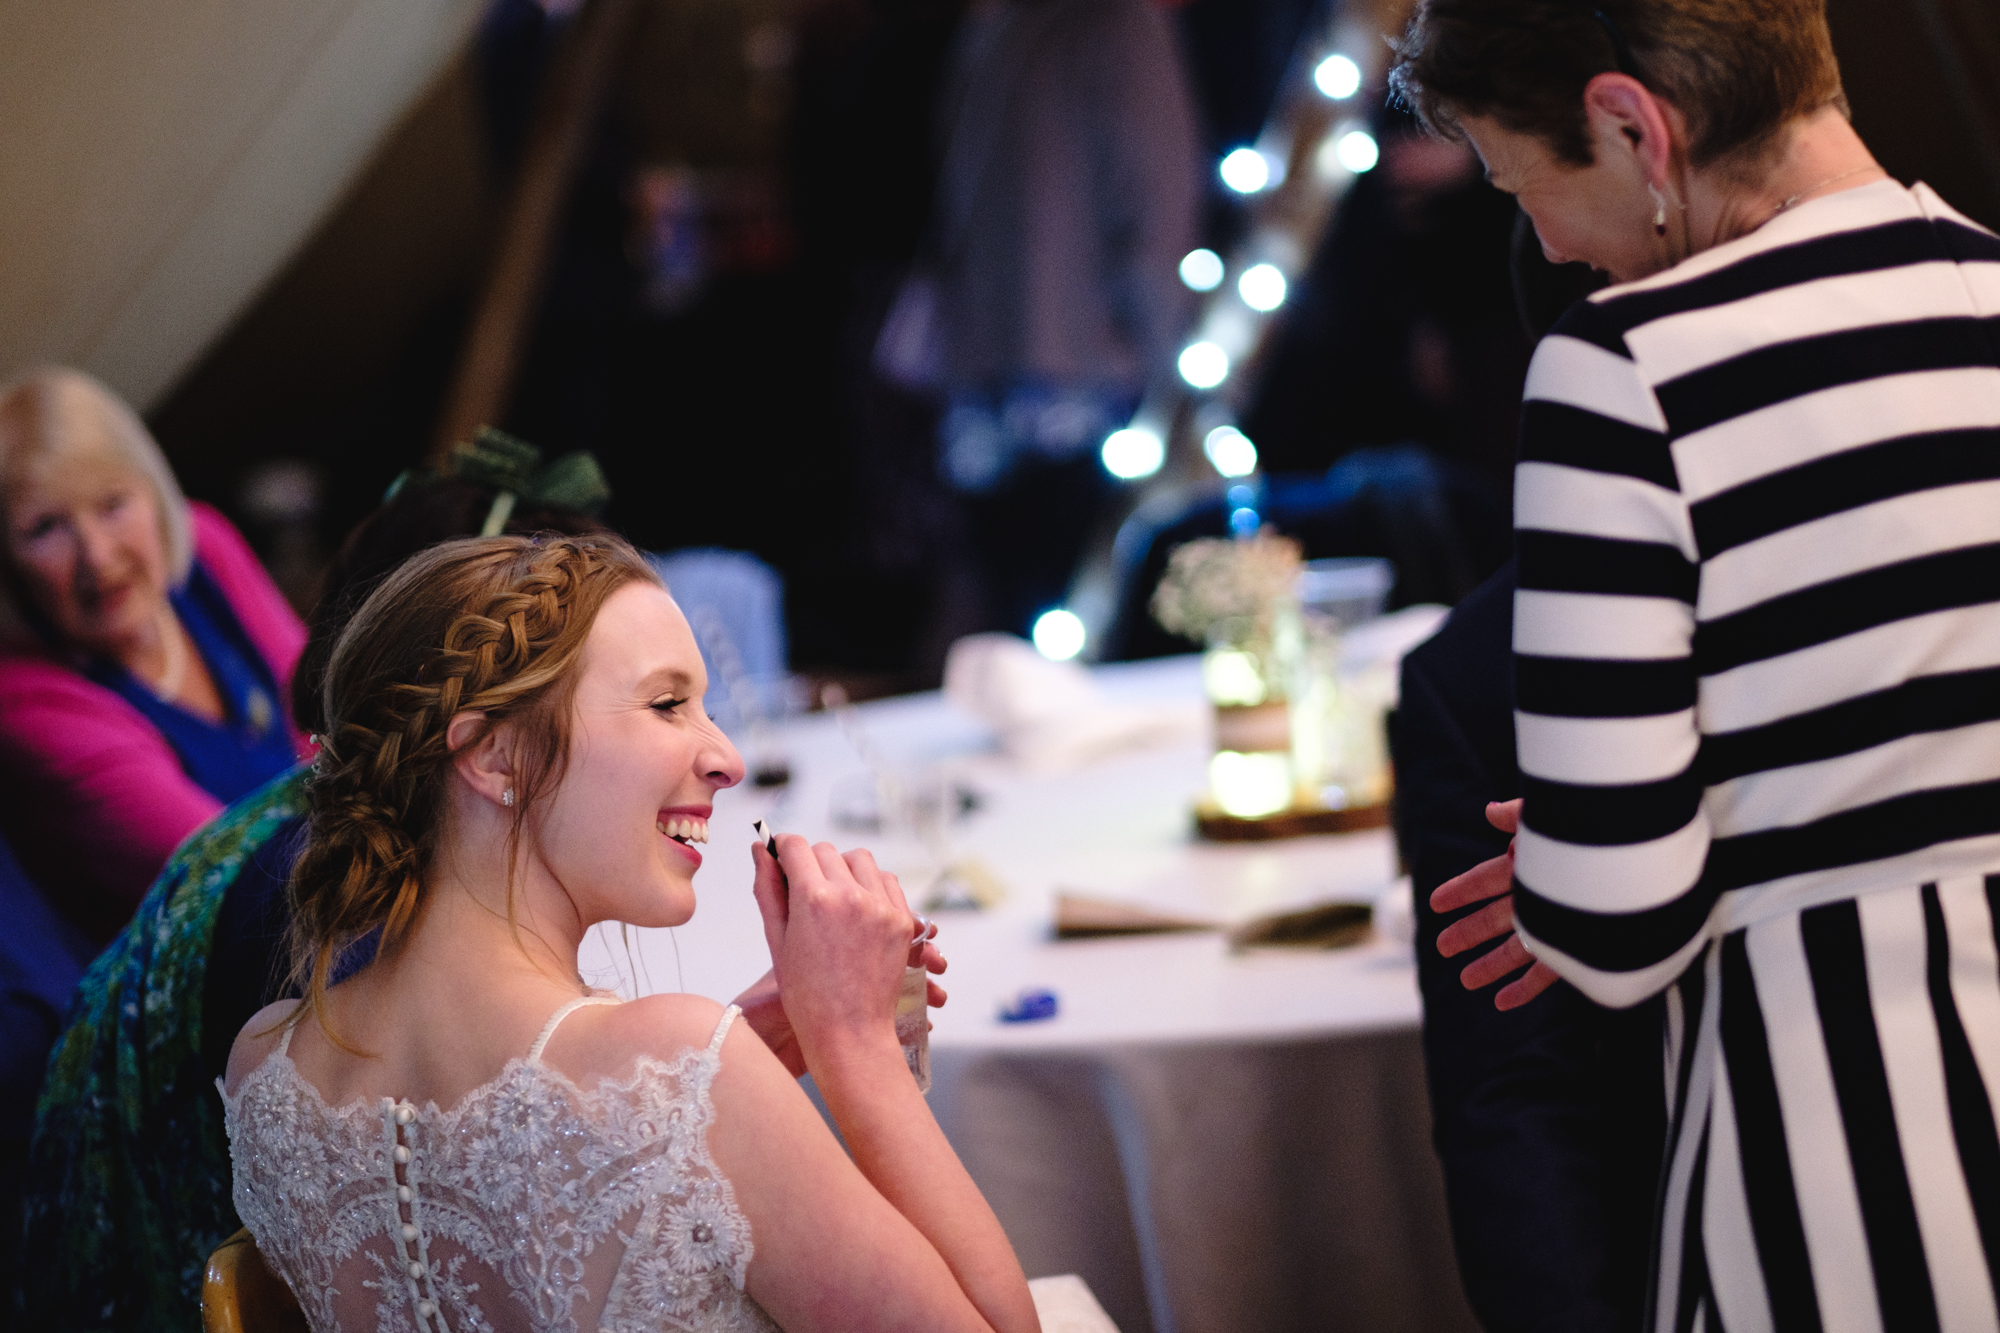 Katie and Dode weddings (206 of 207).jpg